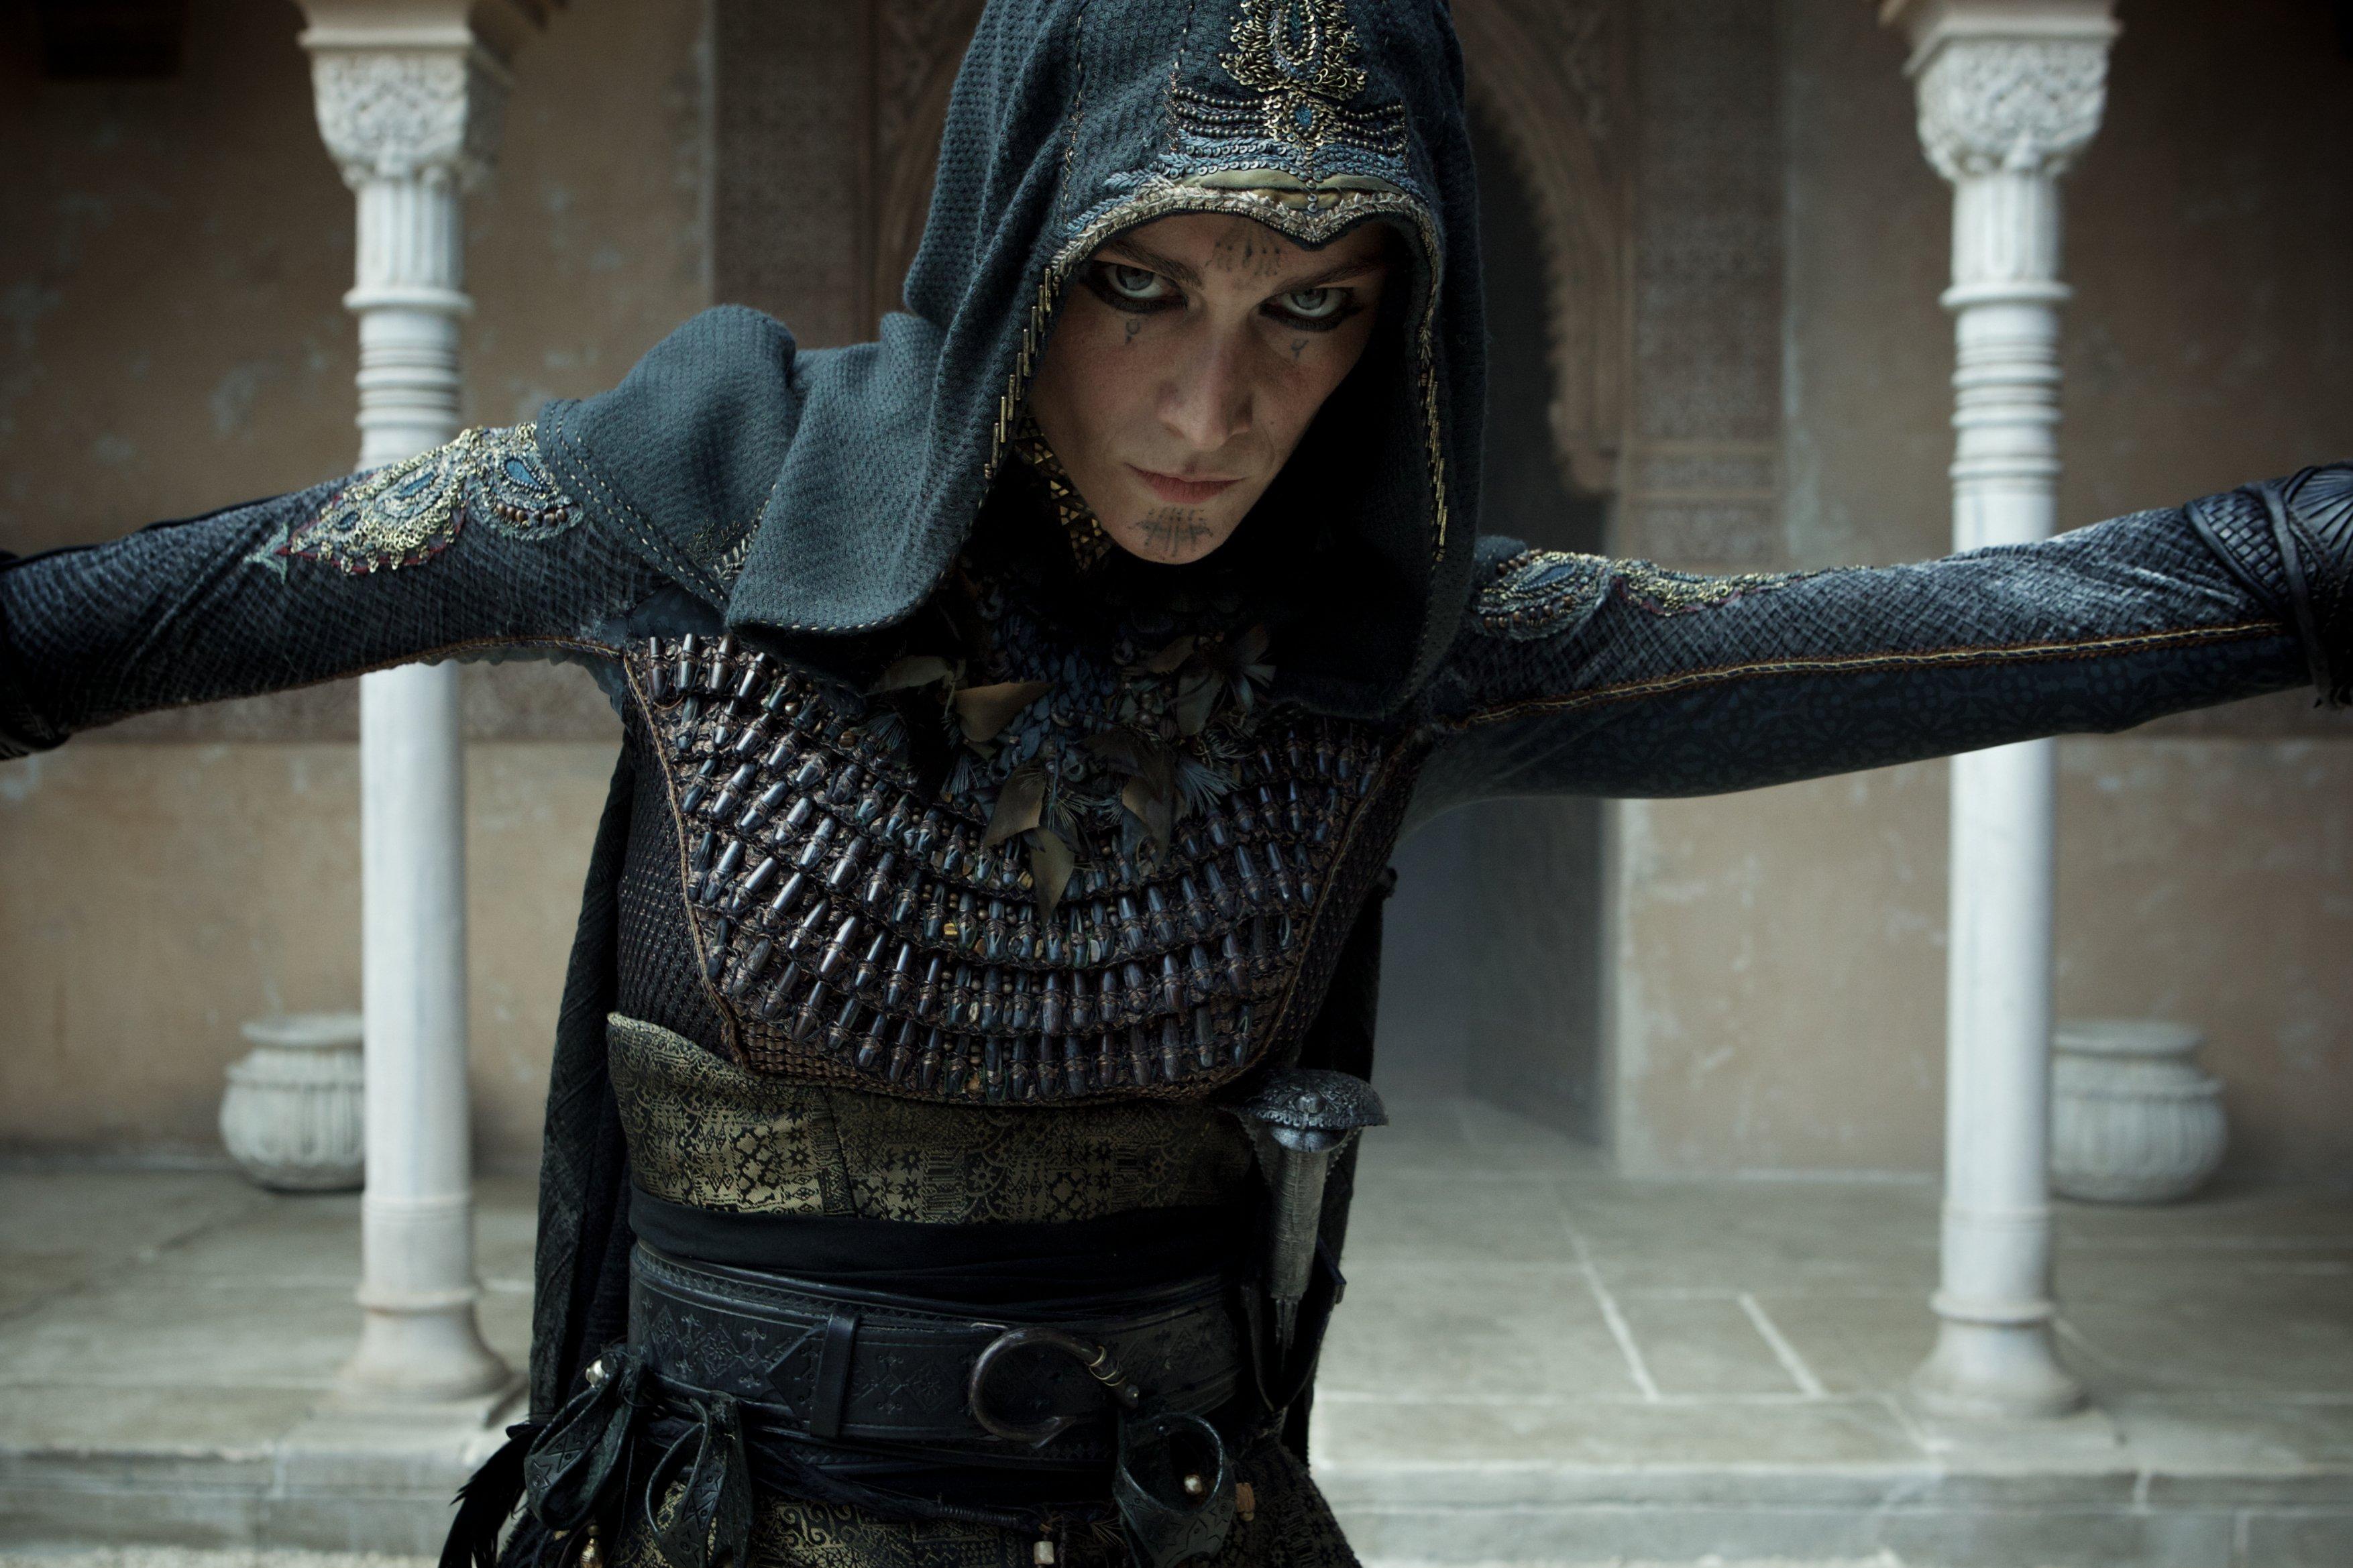 Review - Assassin's Creed - Still 1